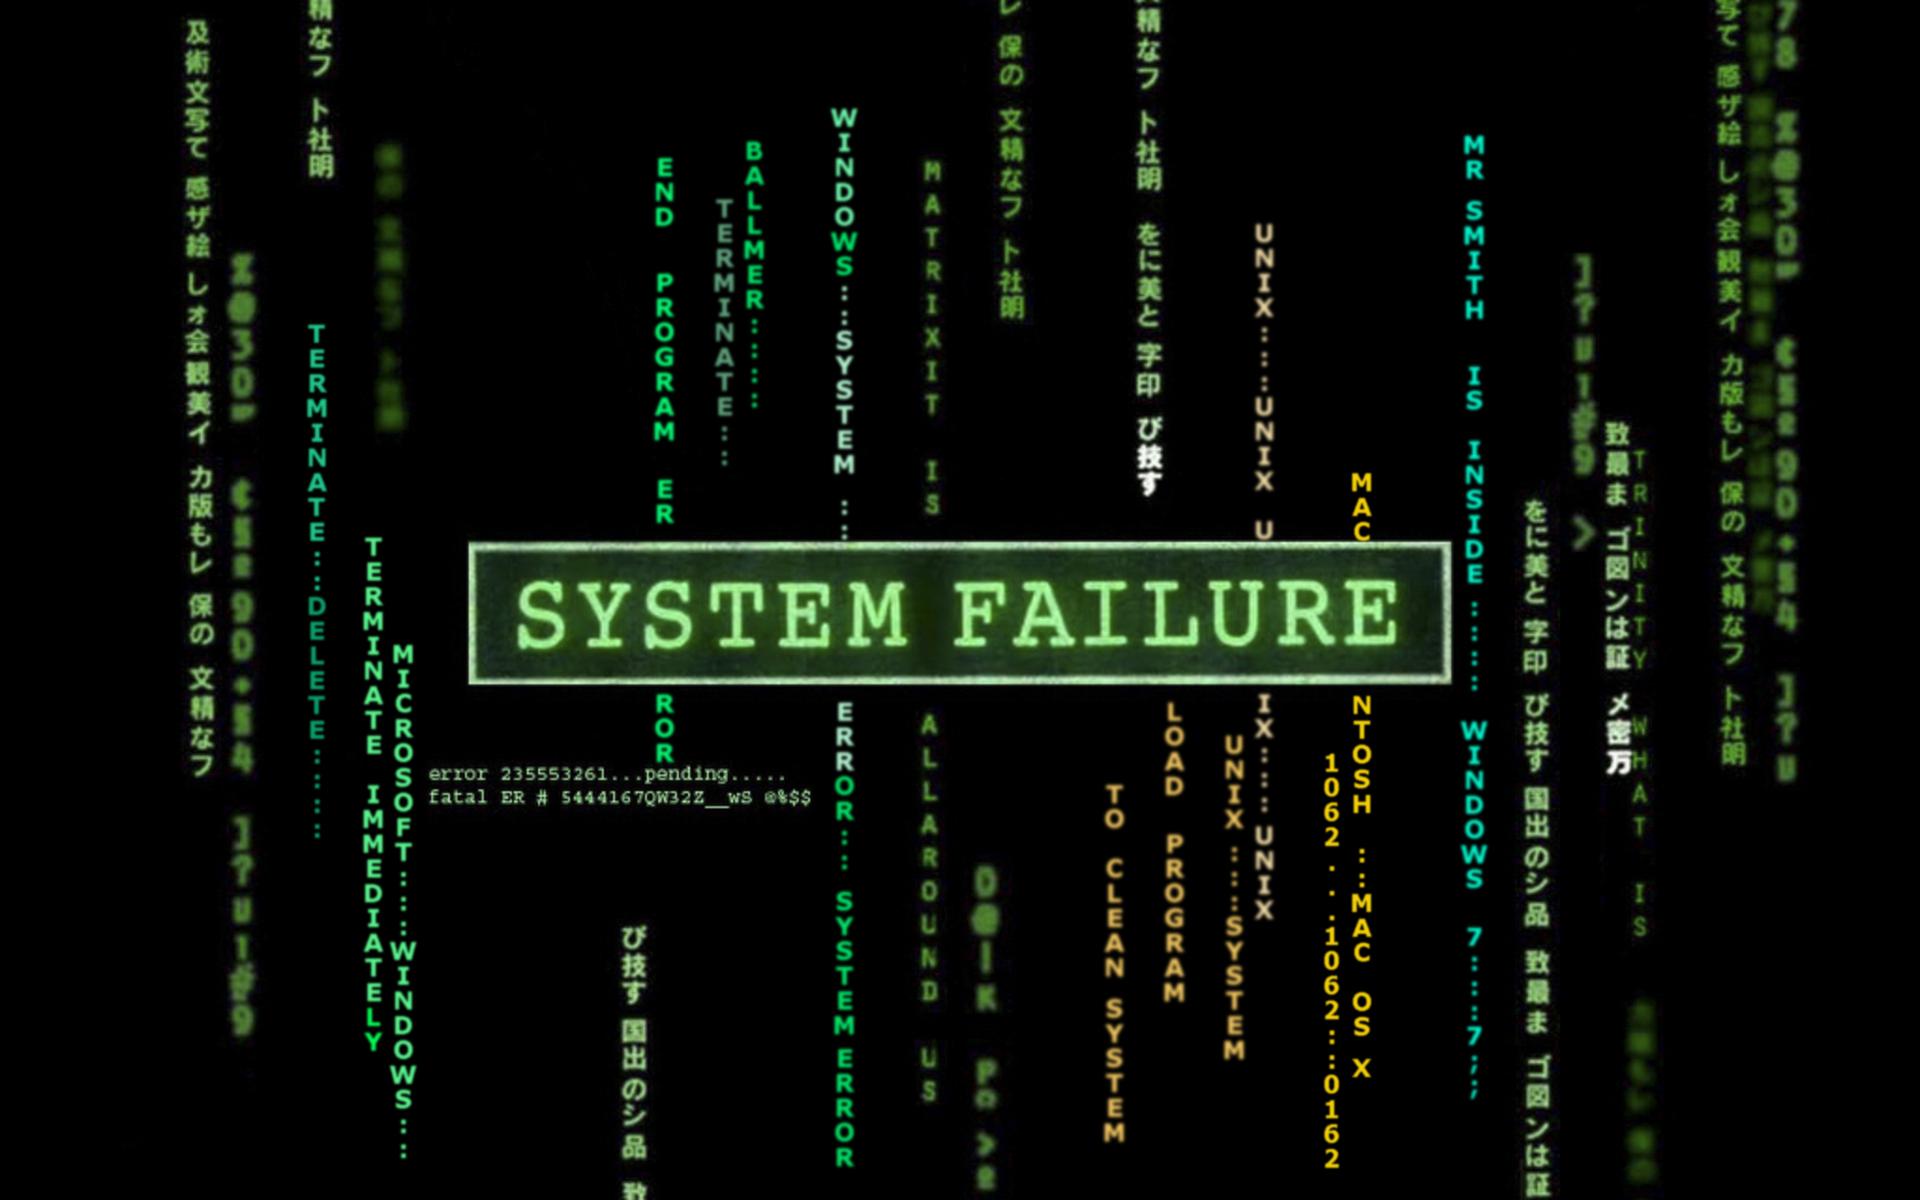 Crash HD Wallpapers System Crash Desktop Wallpapers System Crash 1920x1200